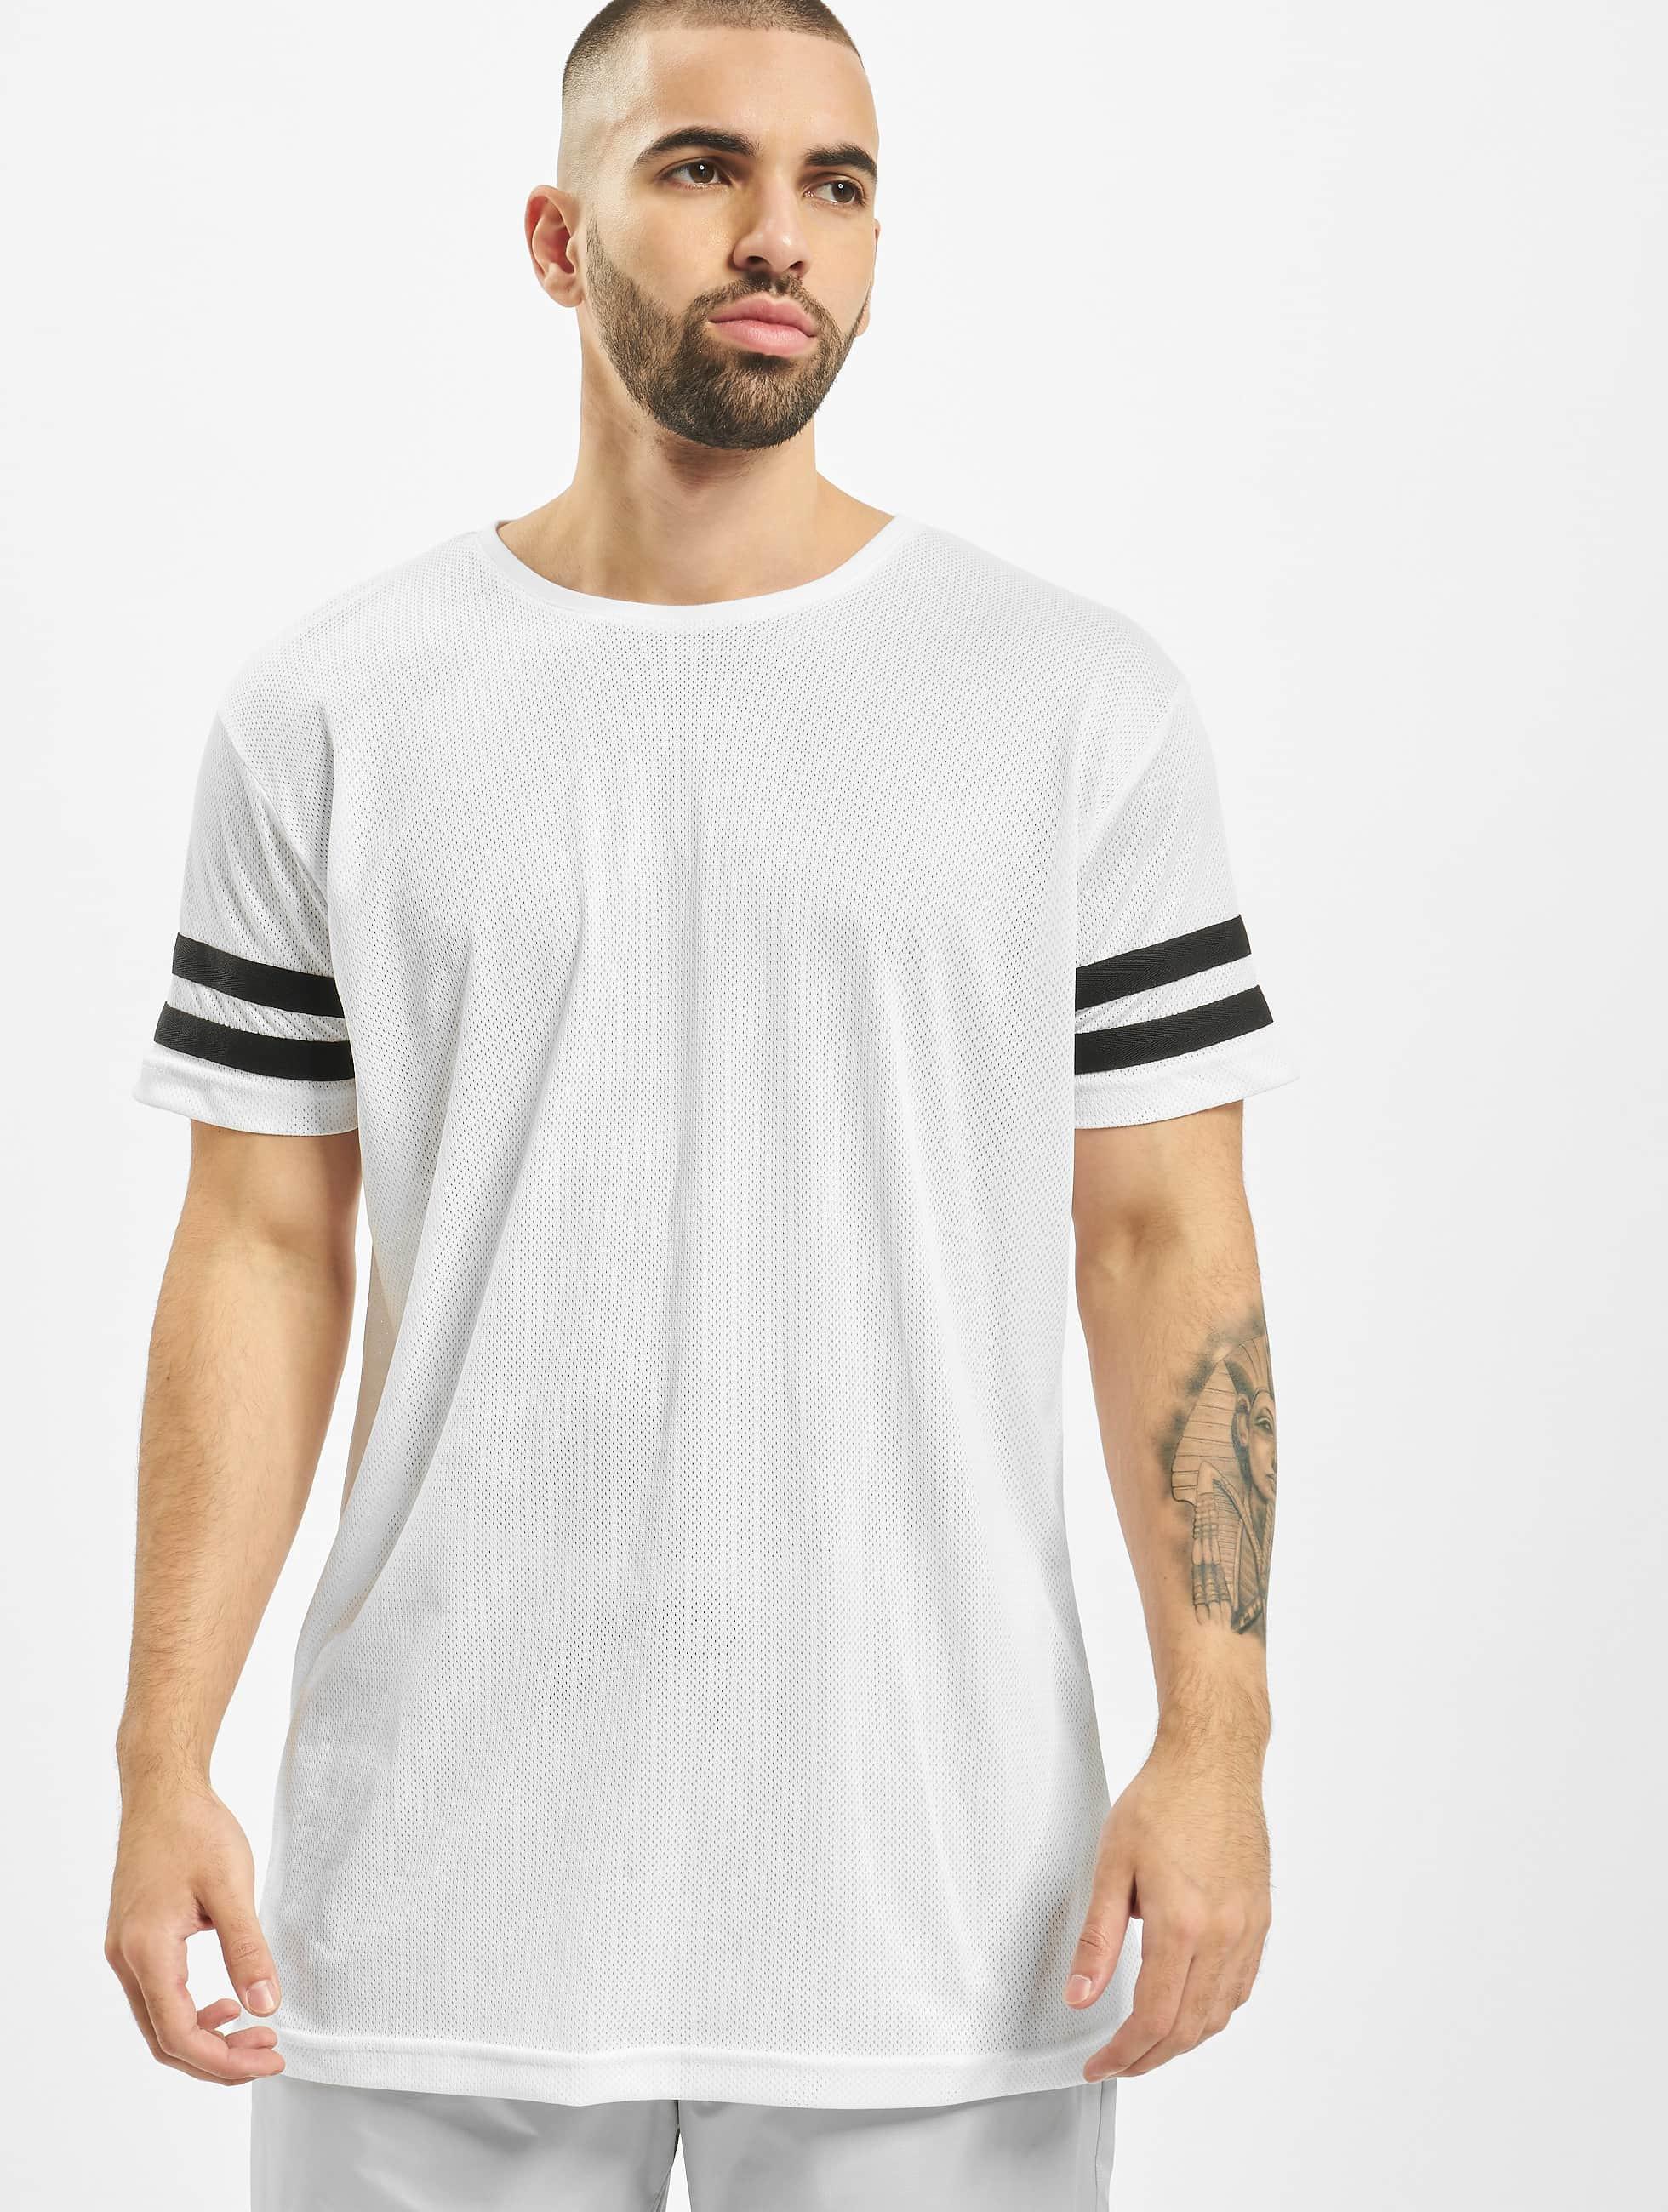 Urban Classics T-paidat Stripe Mesh valkoinen